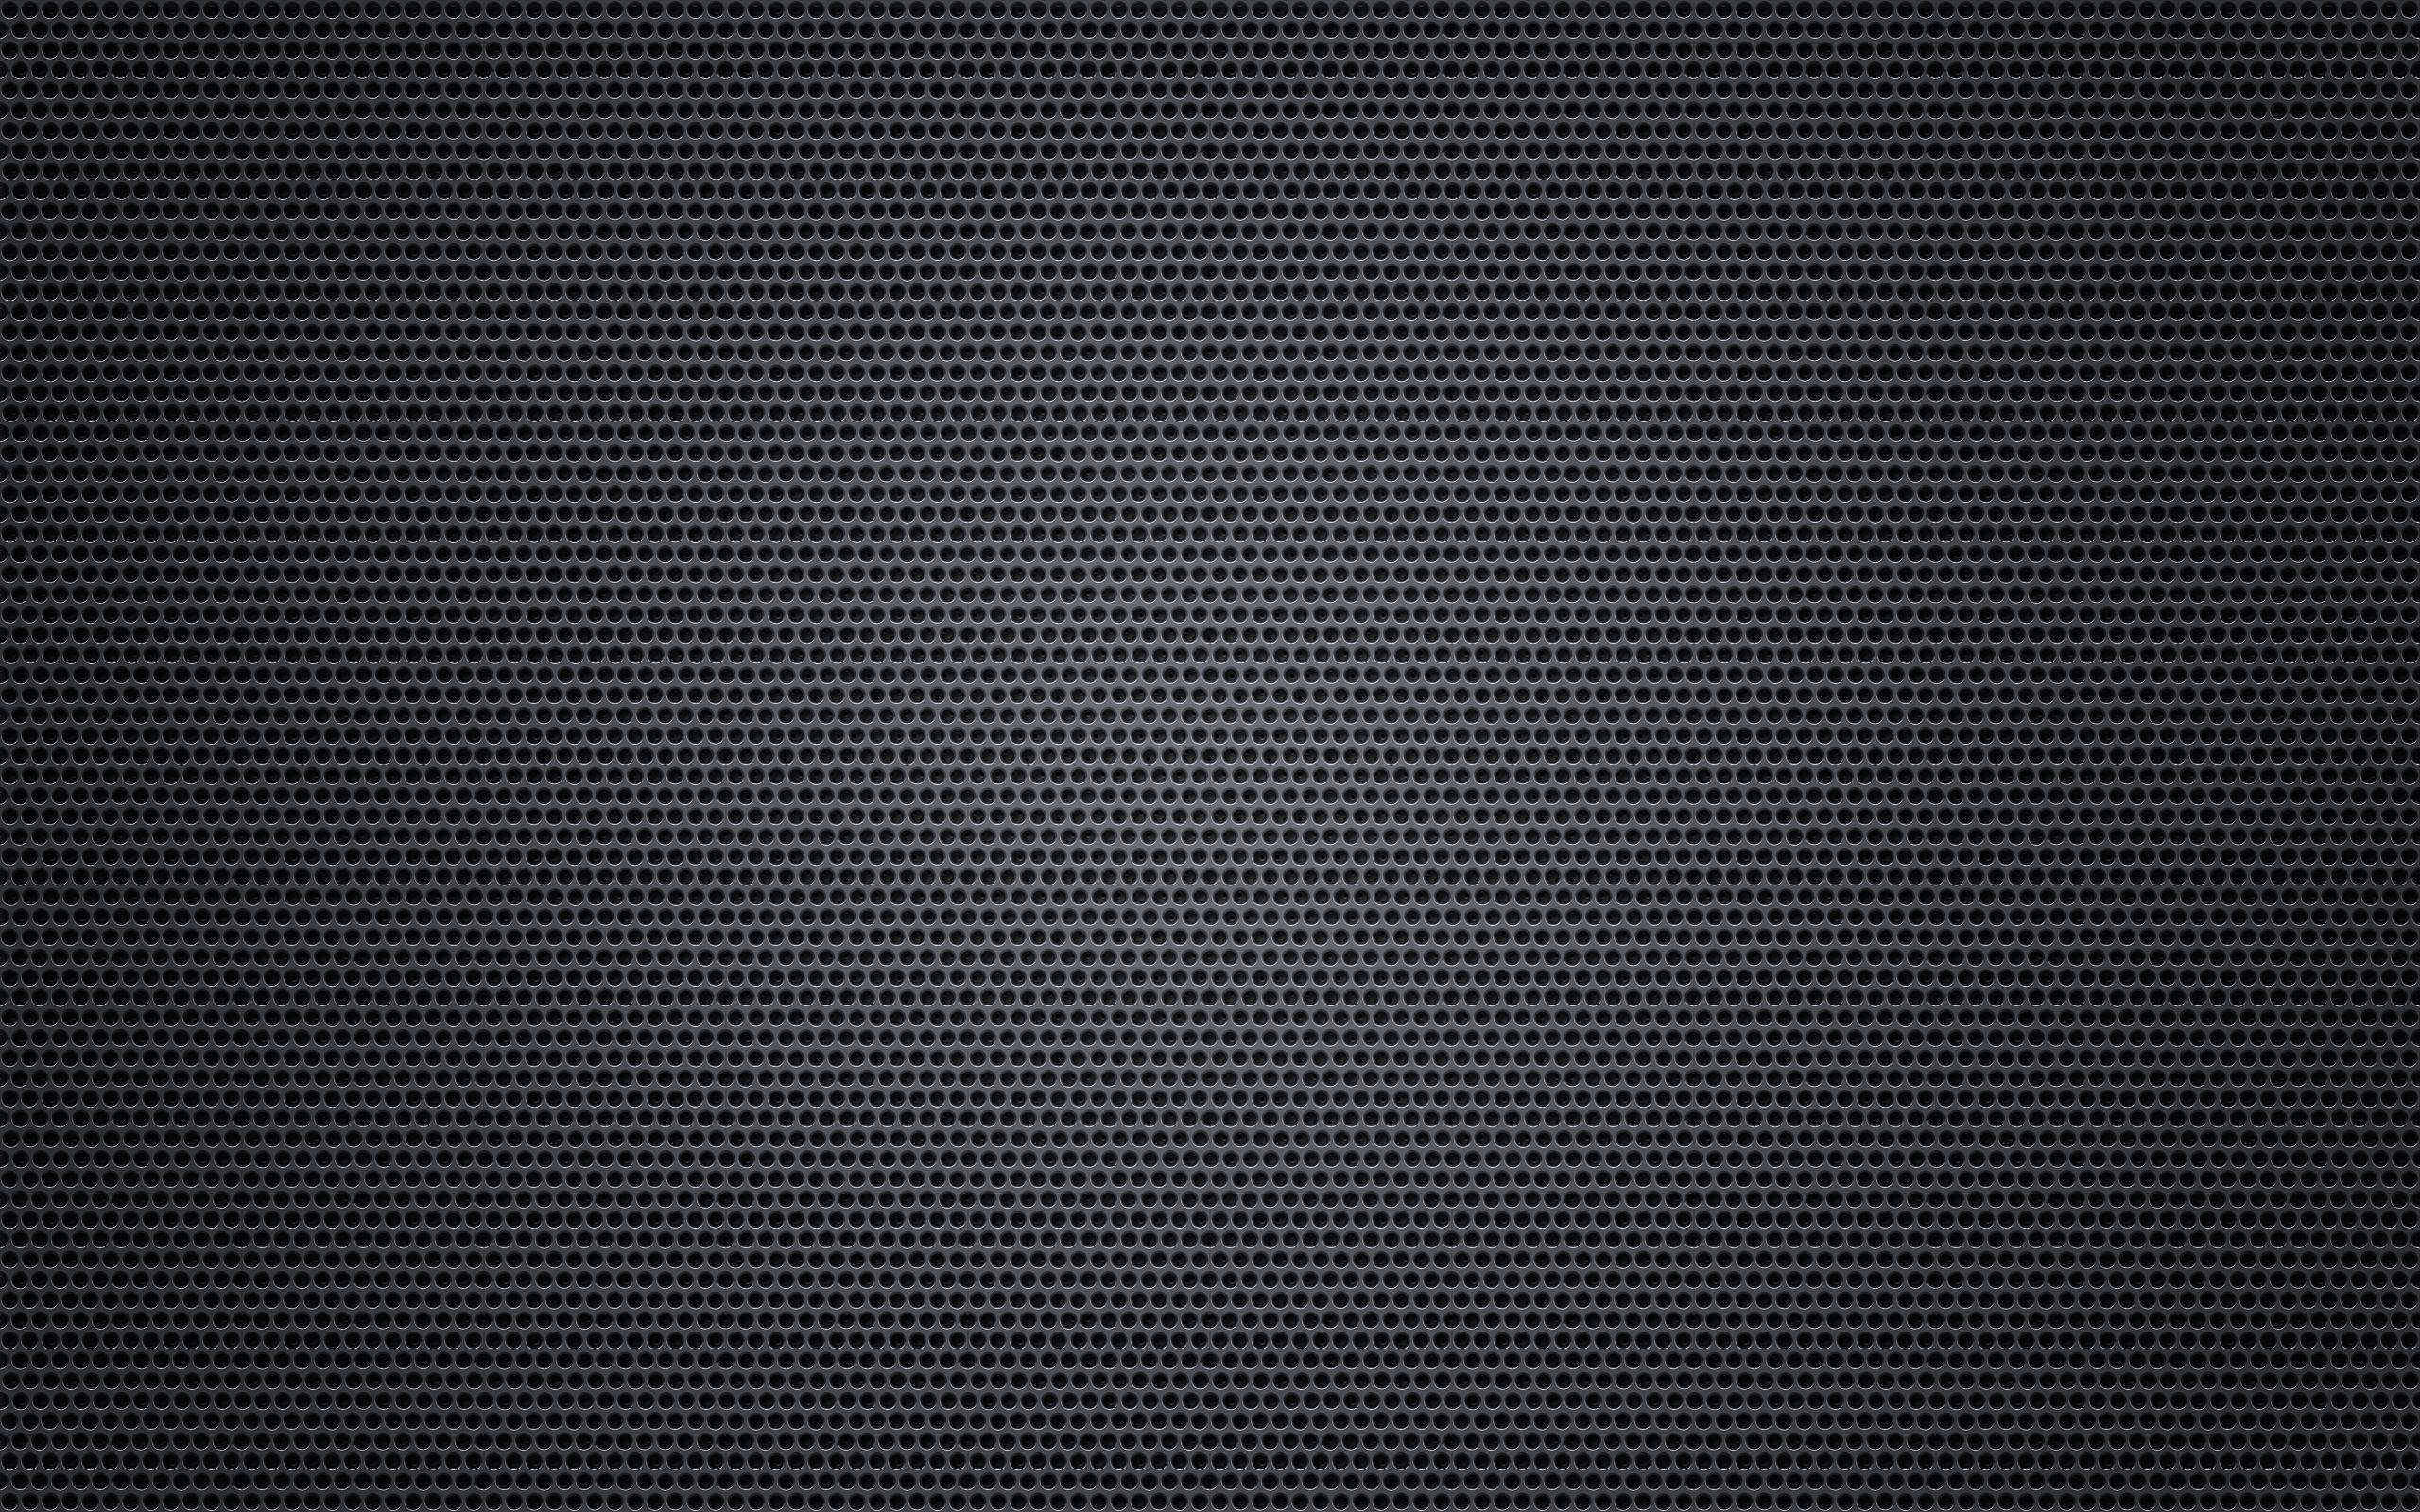 Black Background Images, Metallic